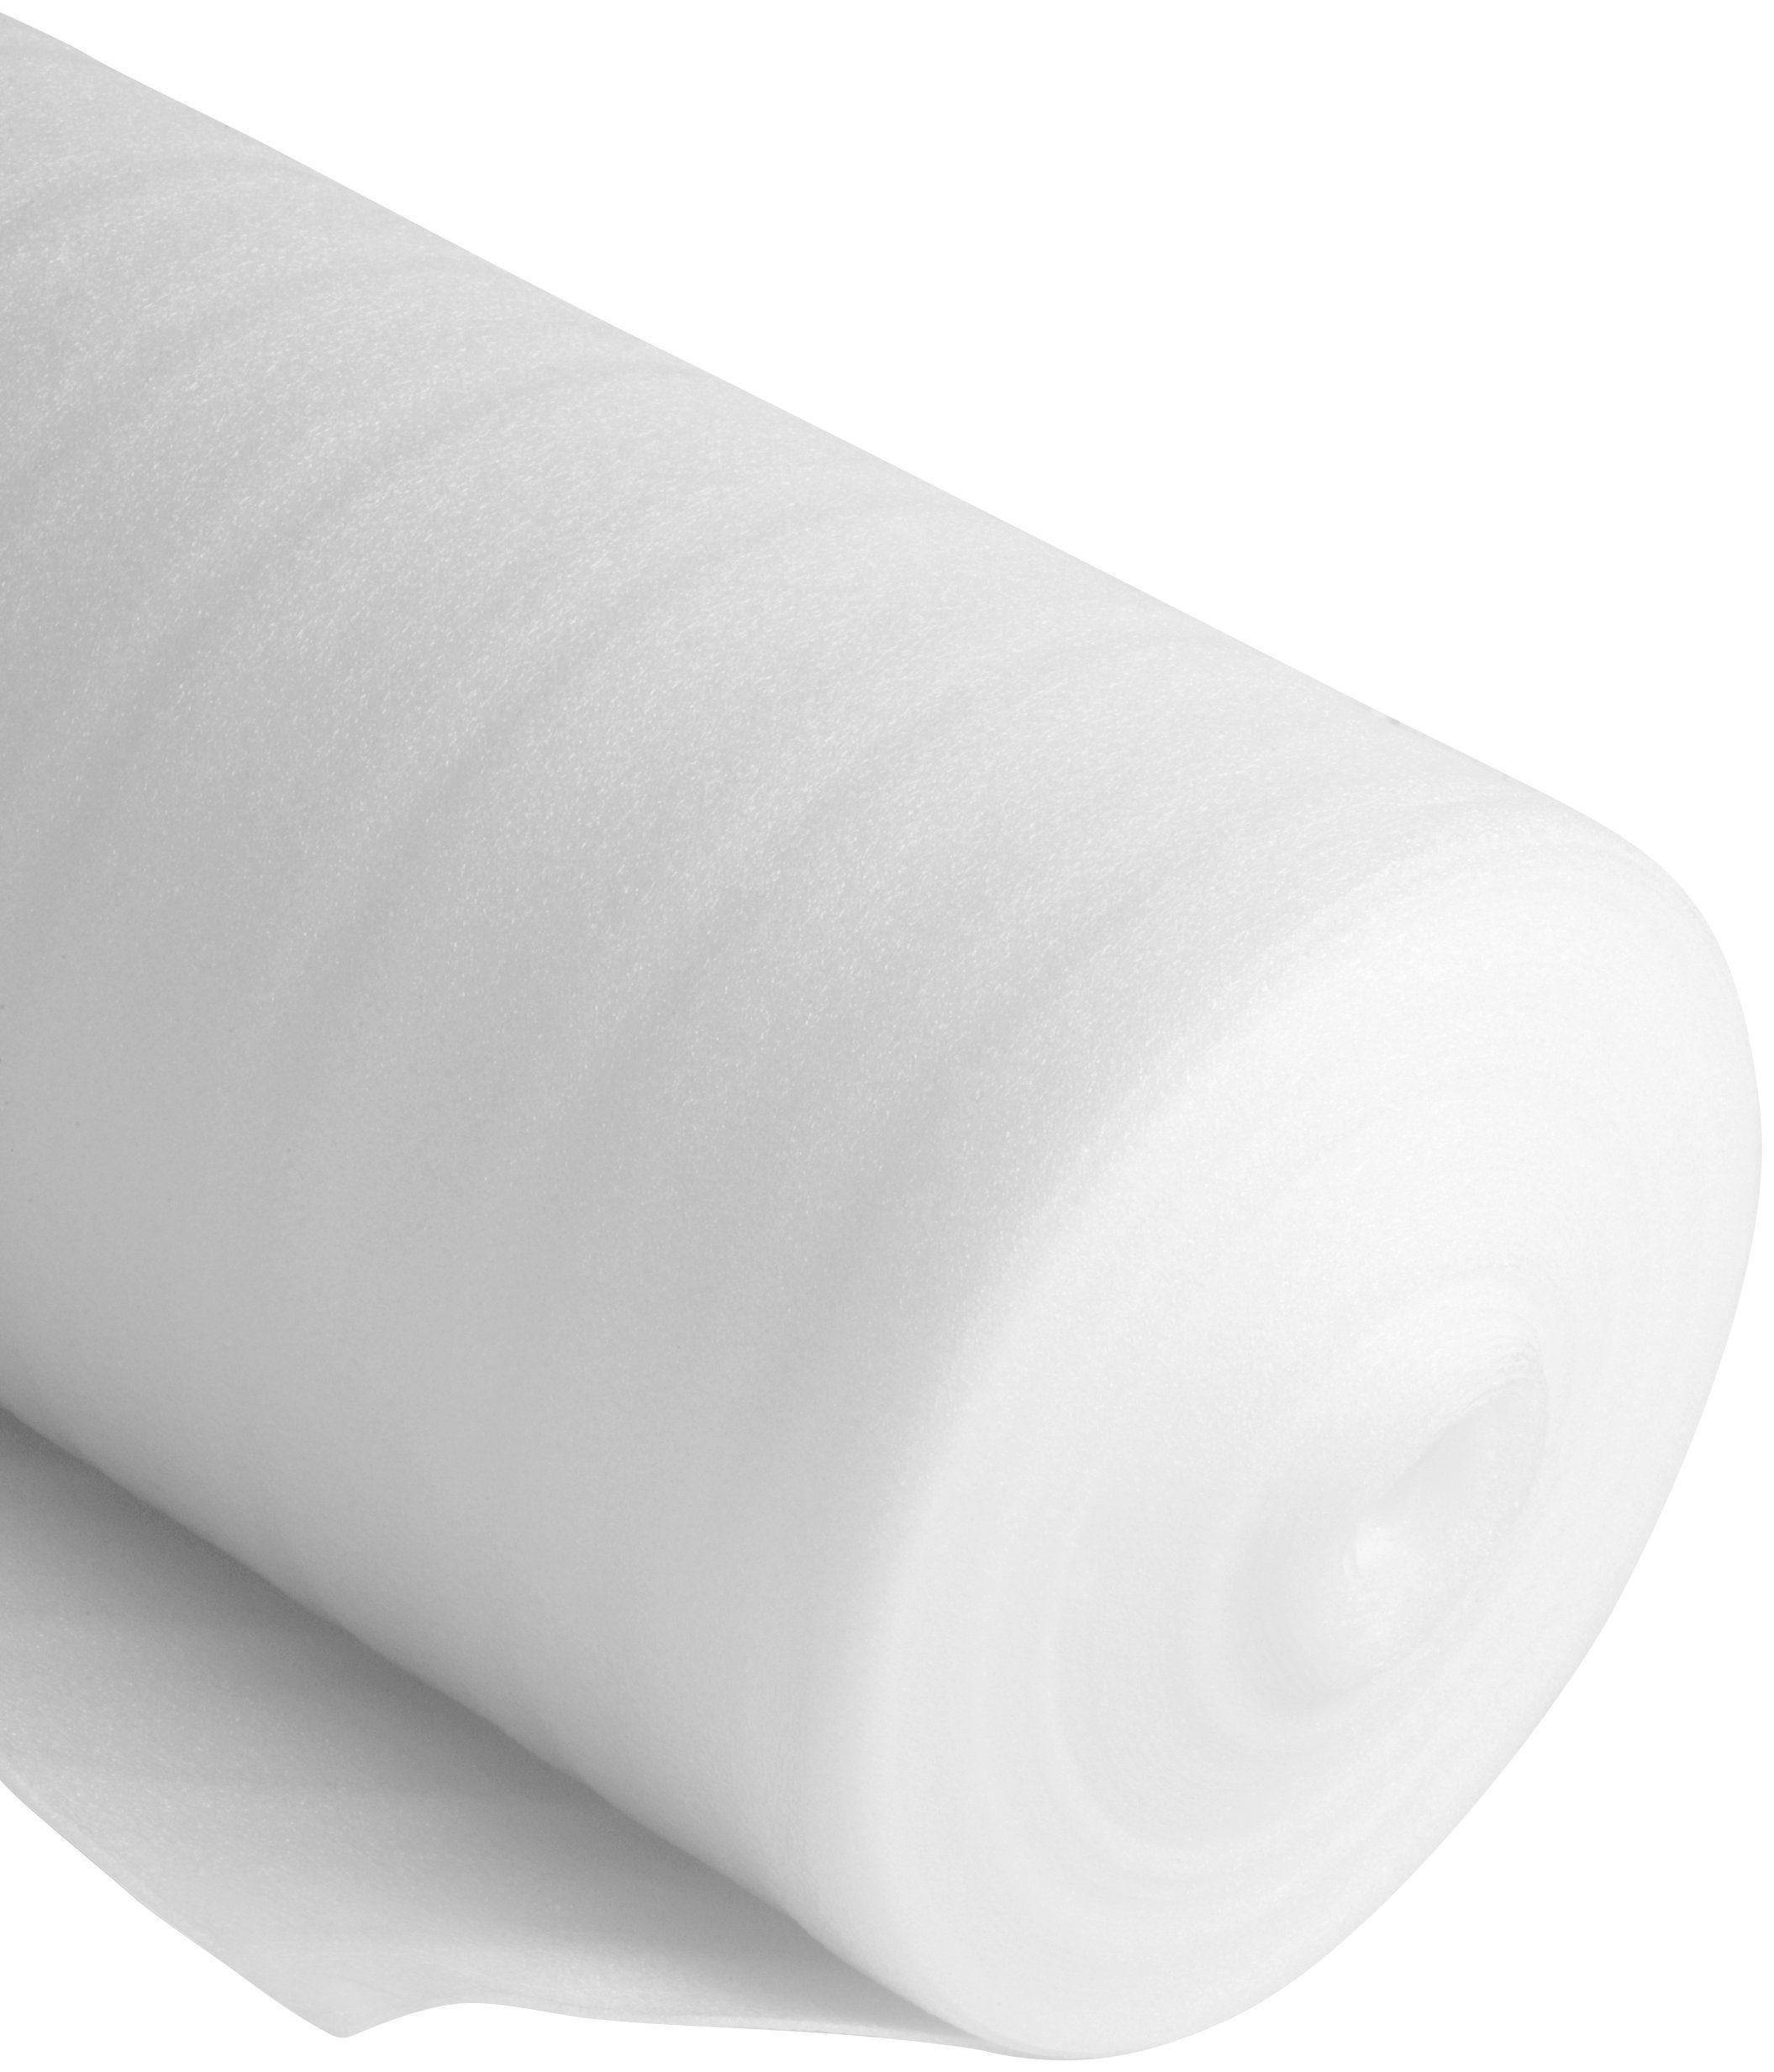 NOMA Laminat/ Parkettunterlage »Noma®Parkett White Roll«, Trittschalldämmung, 15 m², 3 mm